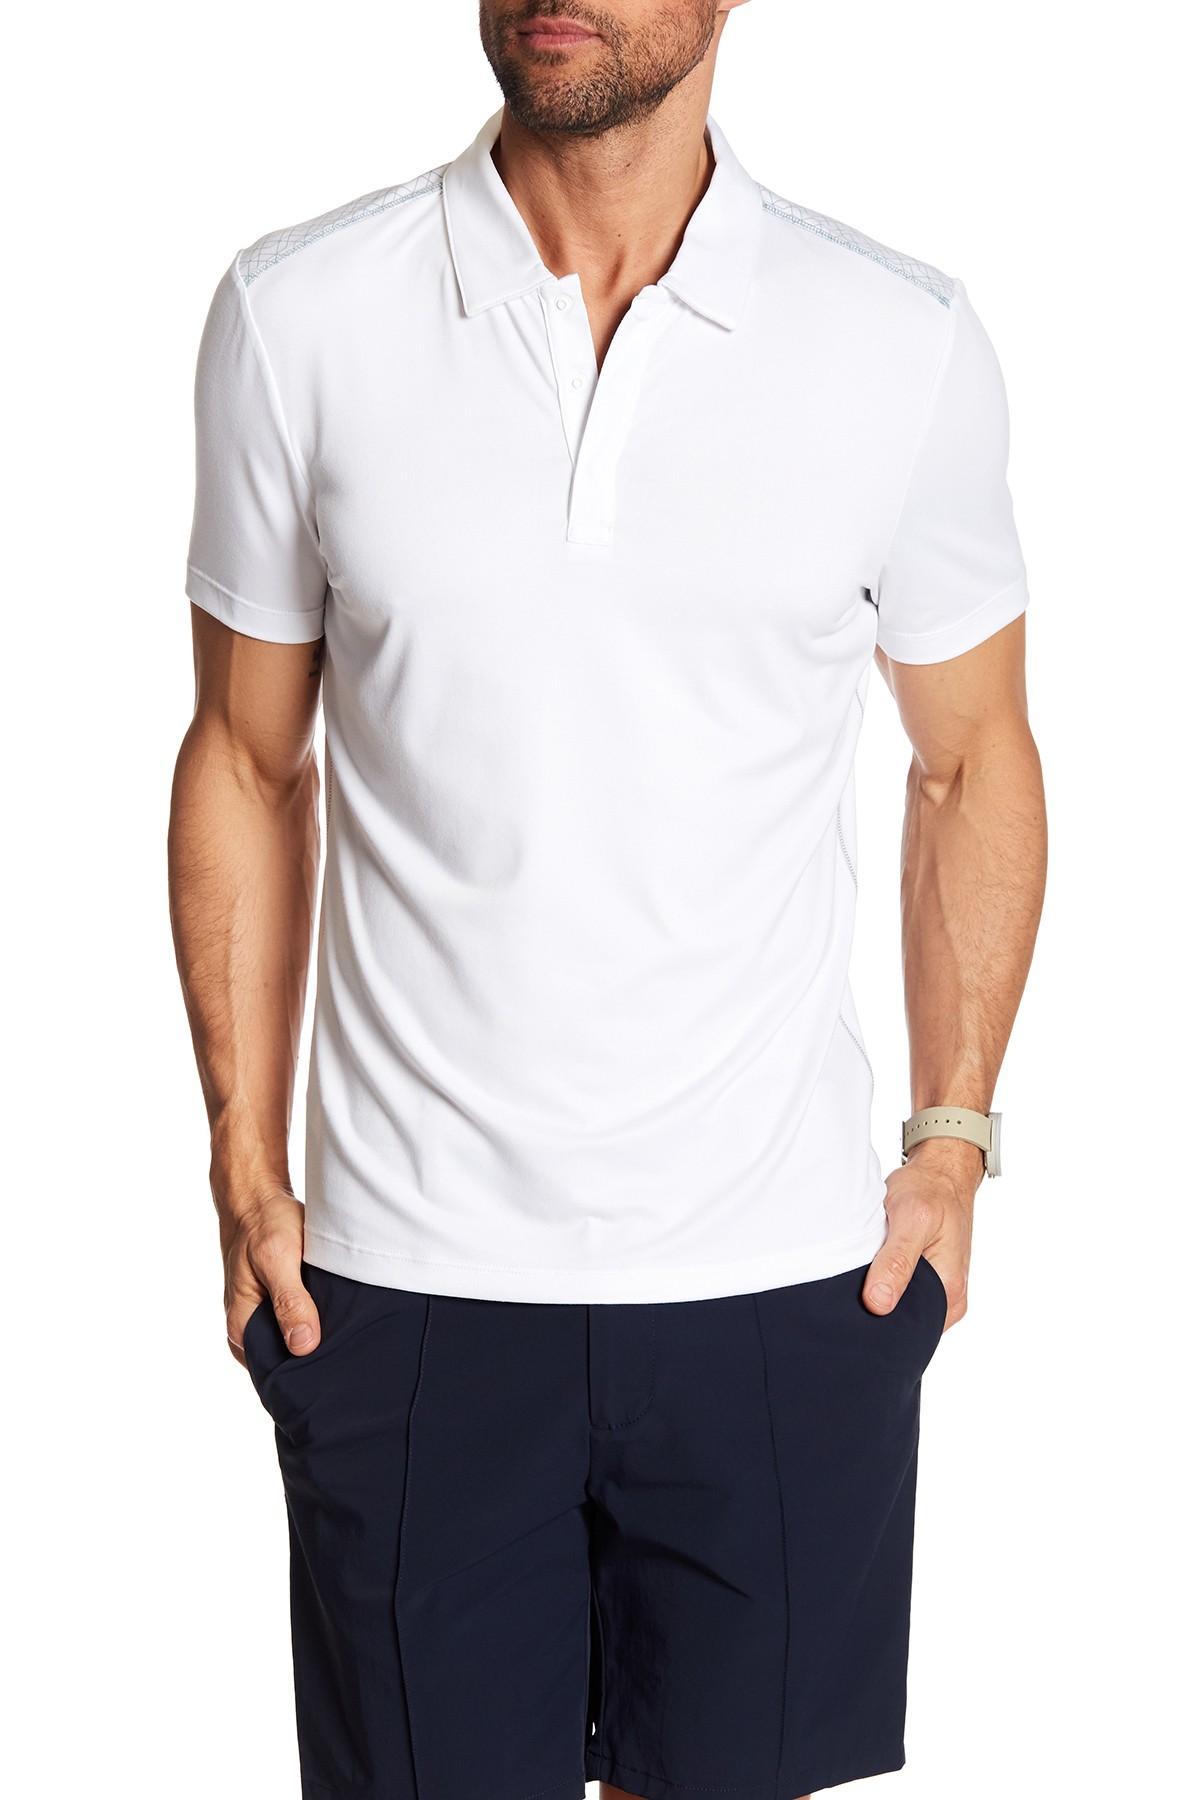 efc52494 Lyst - Perry Ellis Short Sleeve Hidden Placket Polo in White for Men